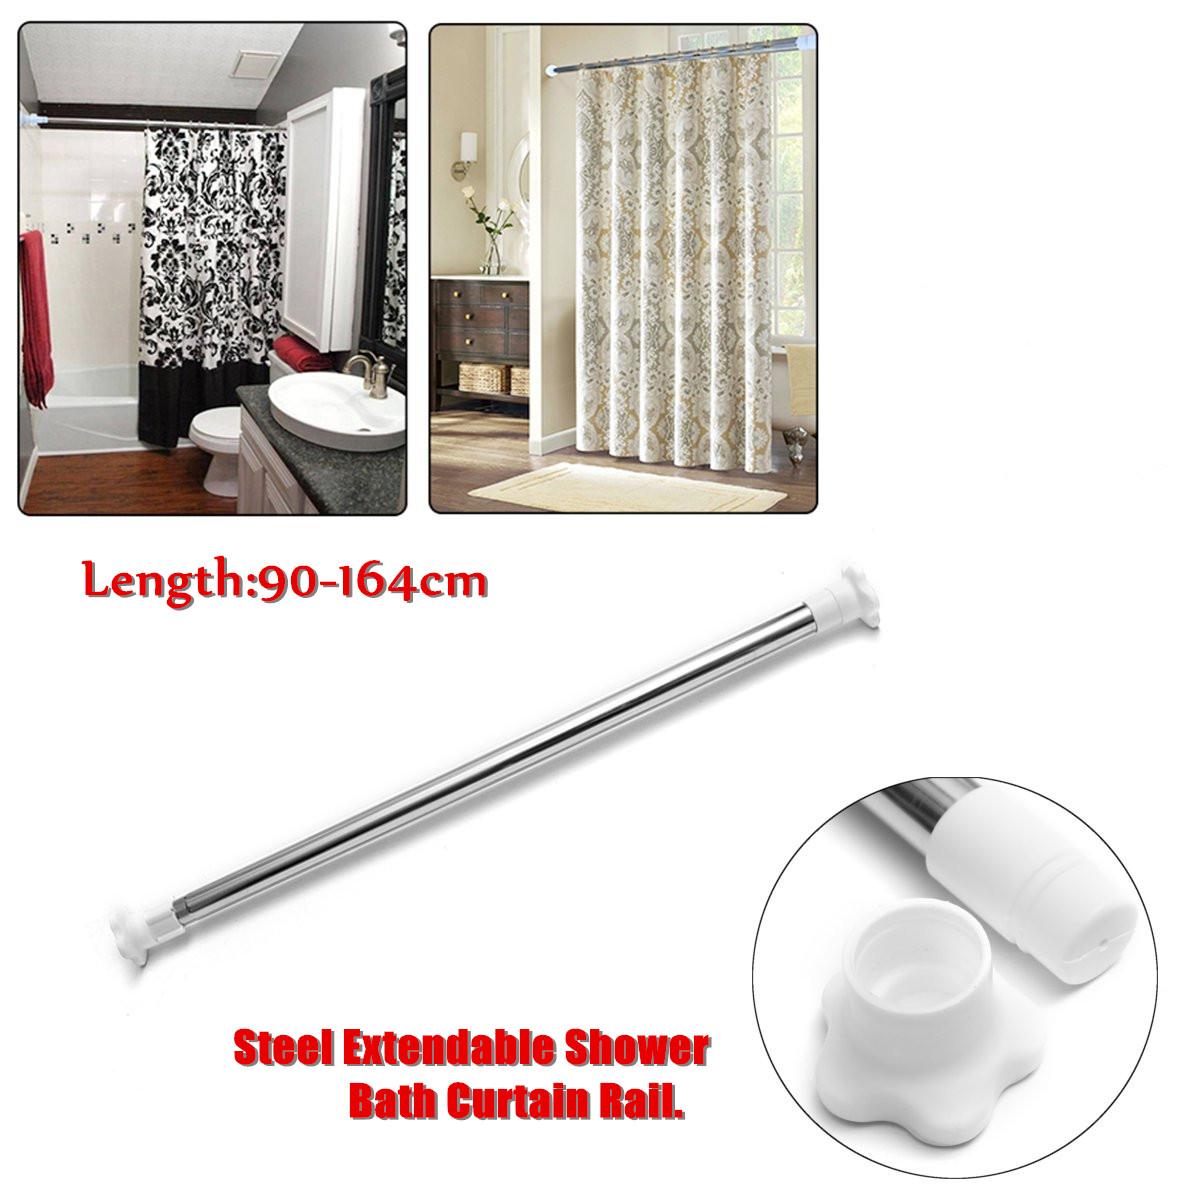 extendable steel telescopic shower curtain rail pole bathroom tension rod bath wardrobe window home room door